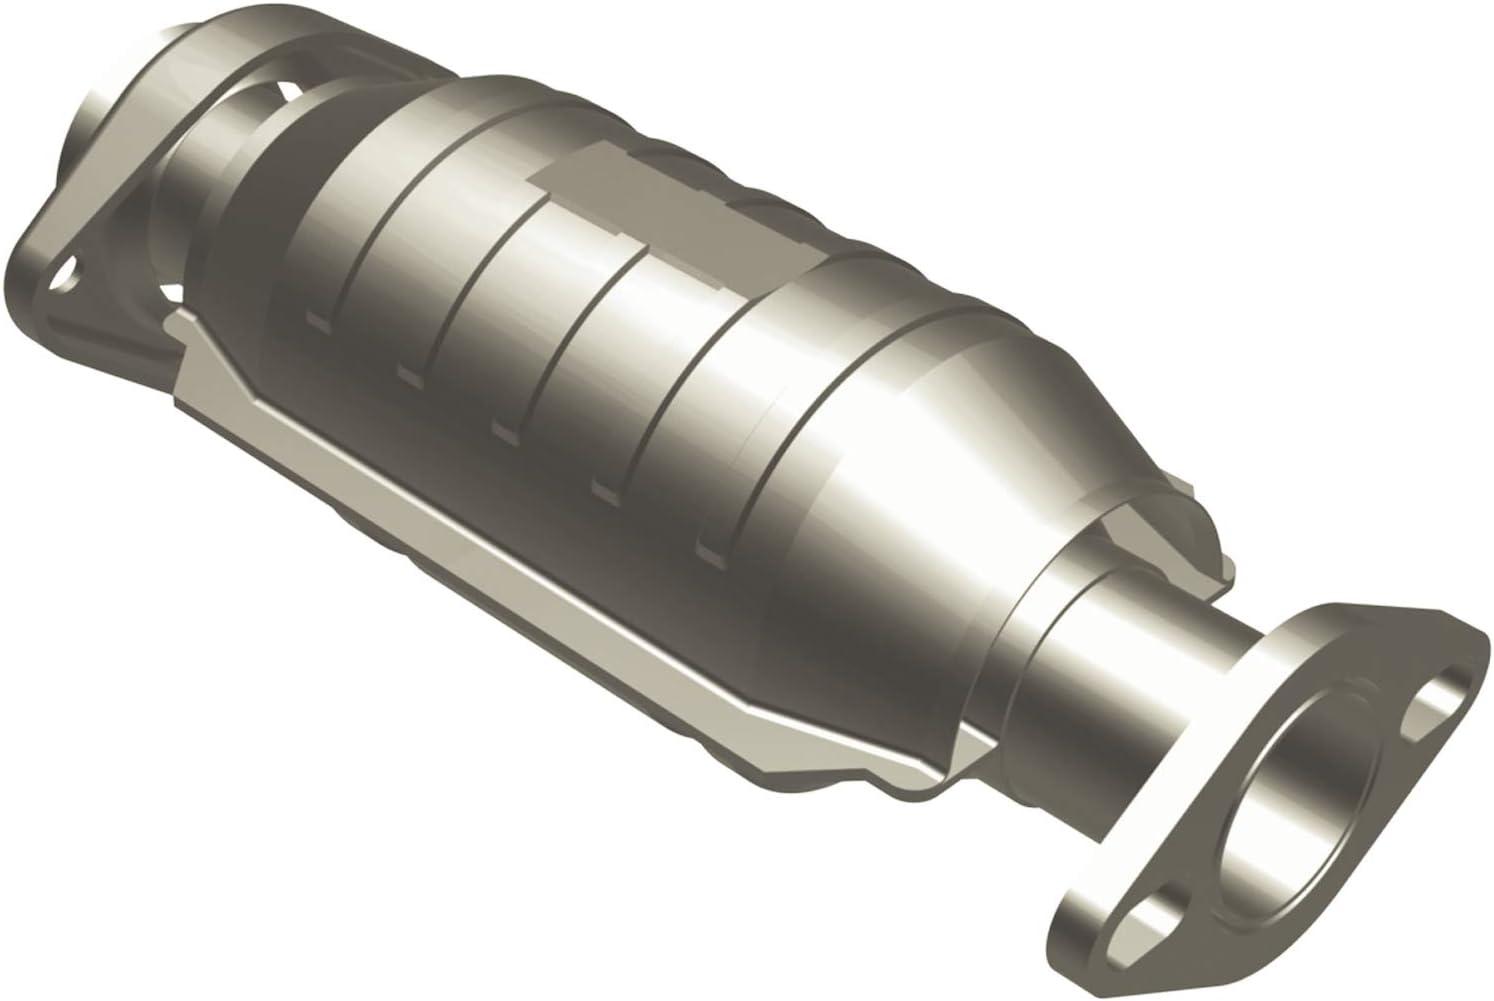 Non CARB compliant MagnaFlow 93127 Direct Fit Catalytic Converter